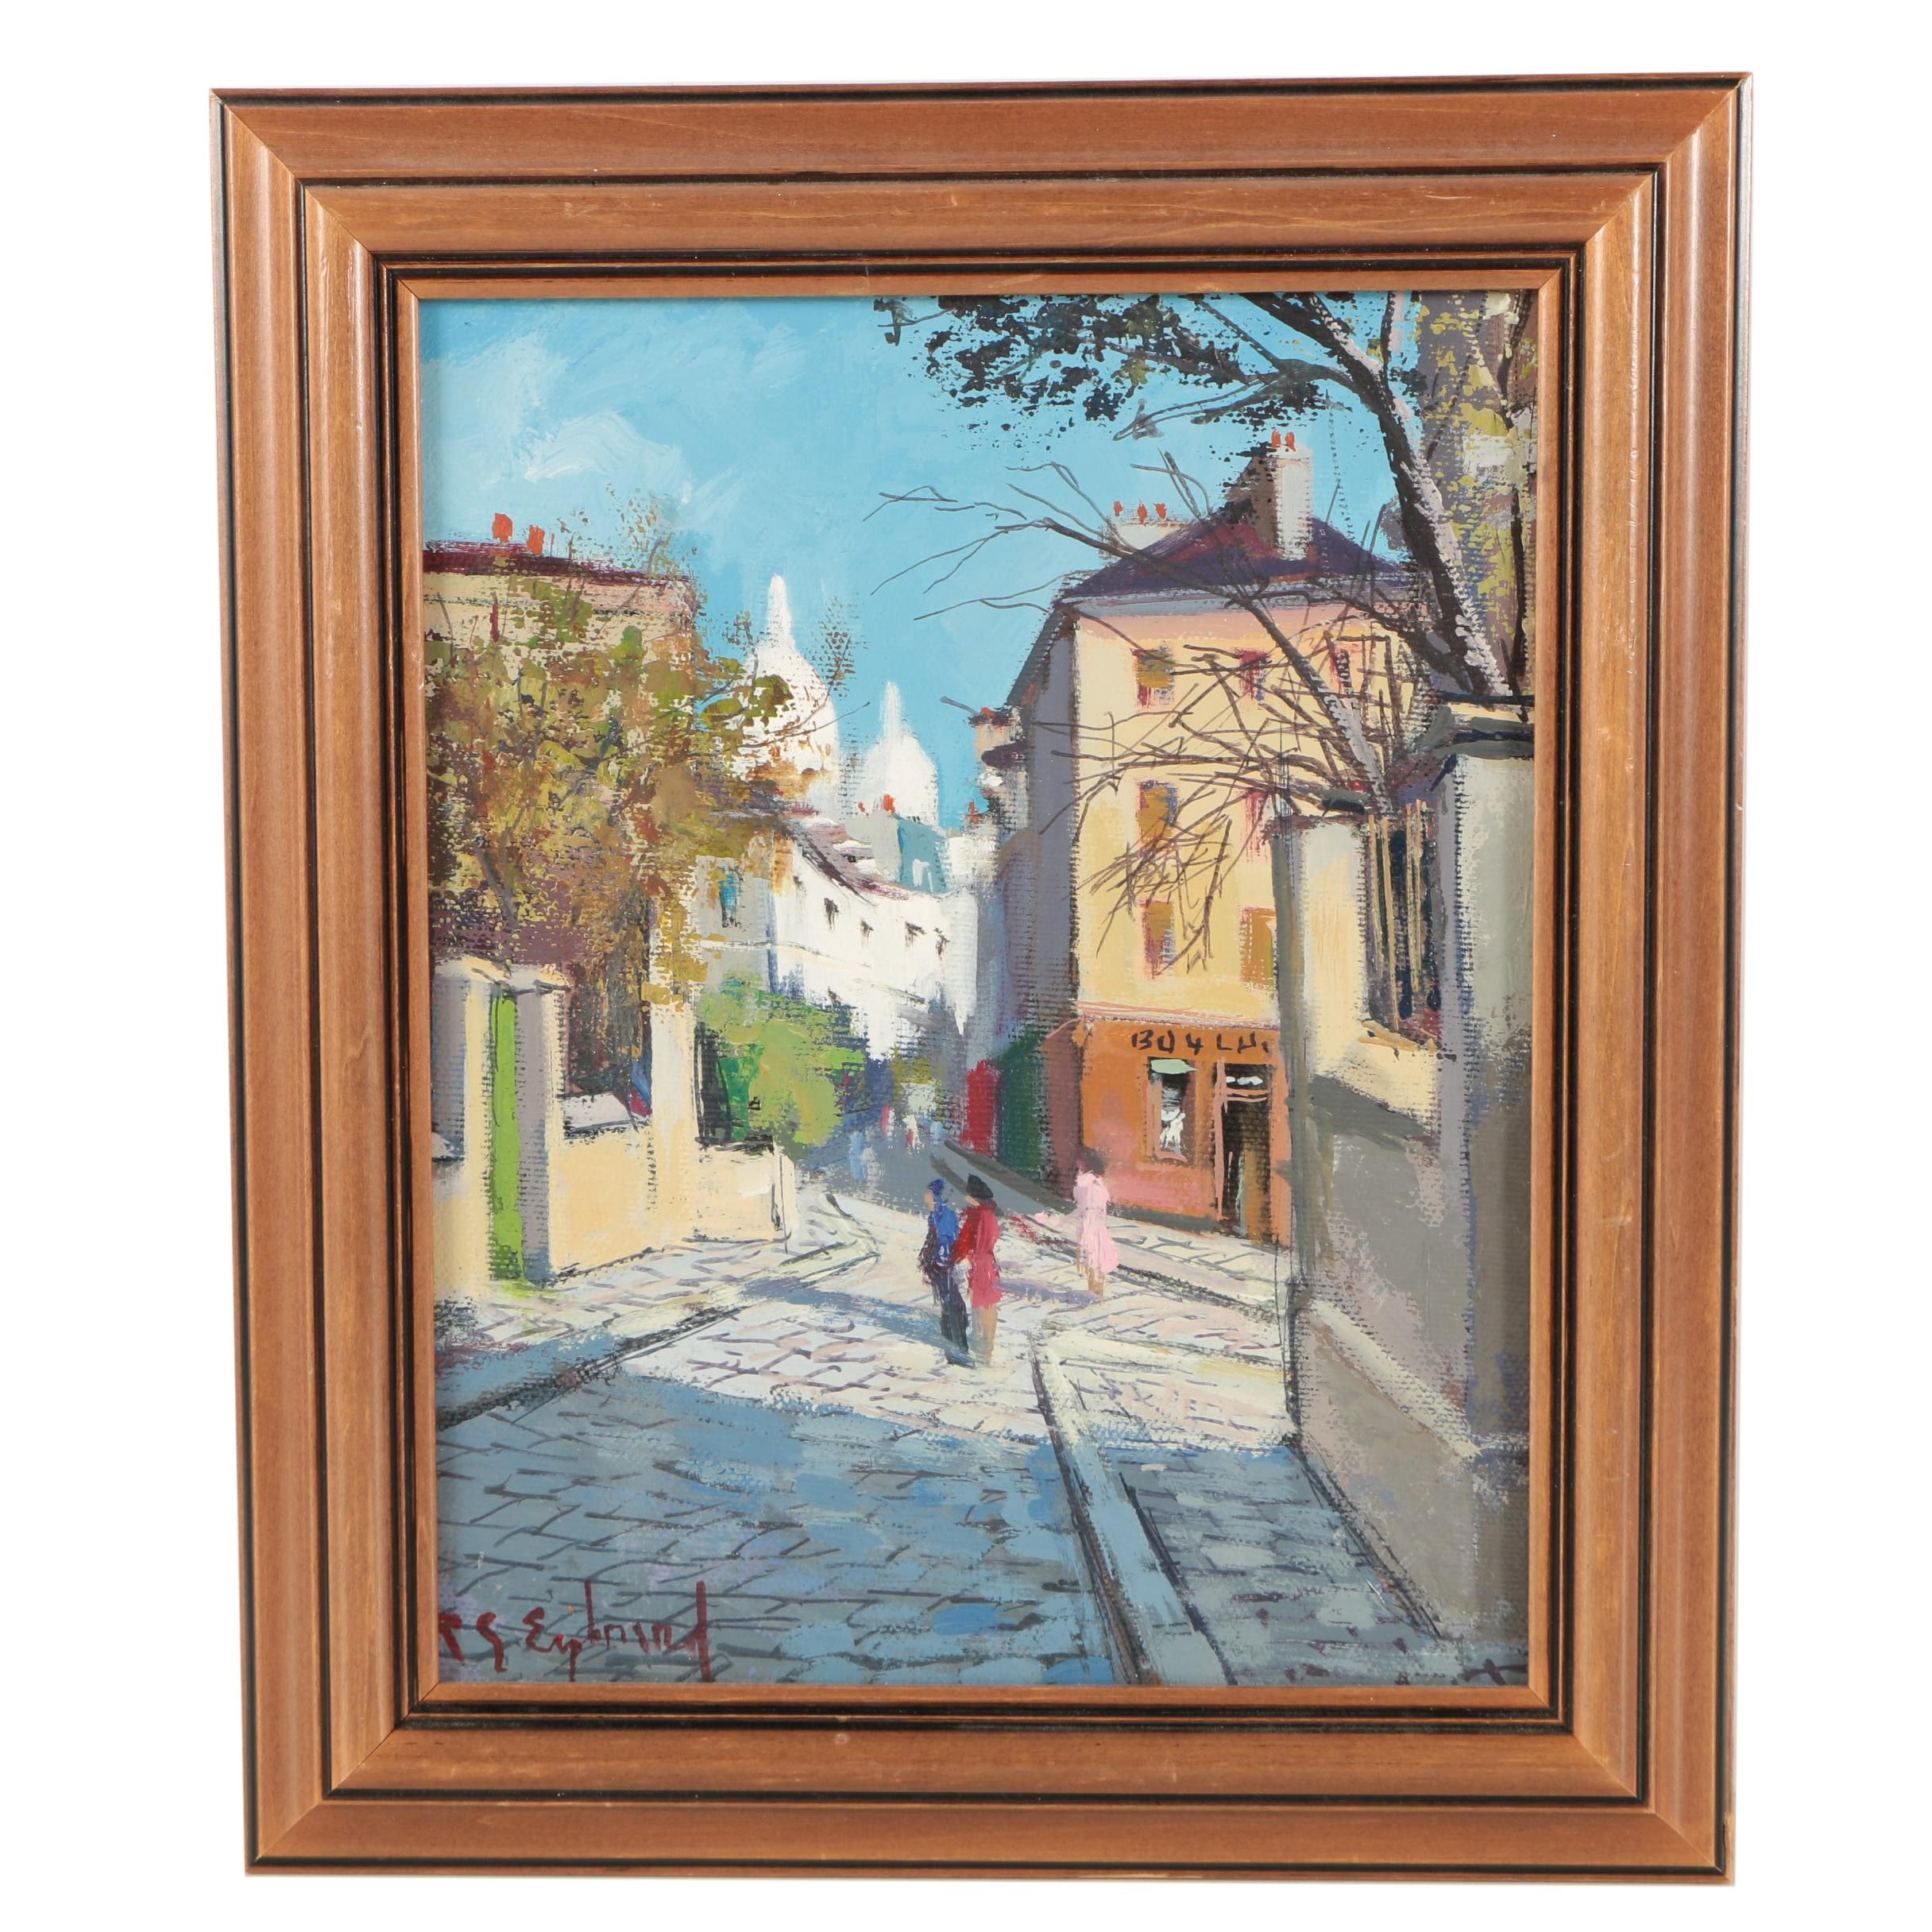 R.G. Eybrard Oil on Canvas of a French Street Scene